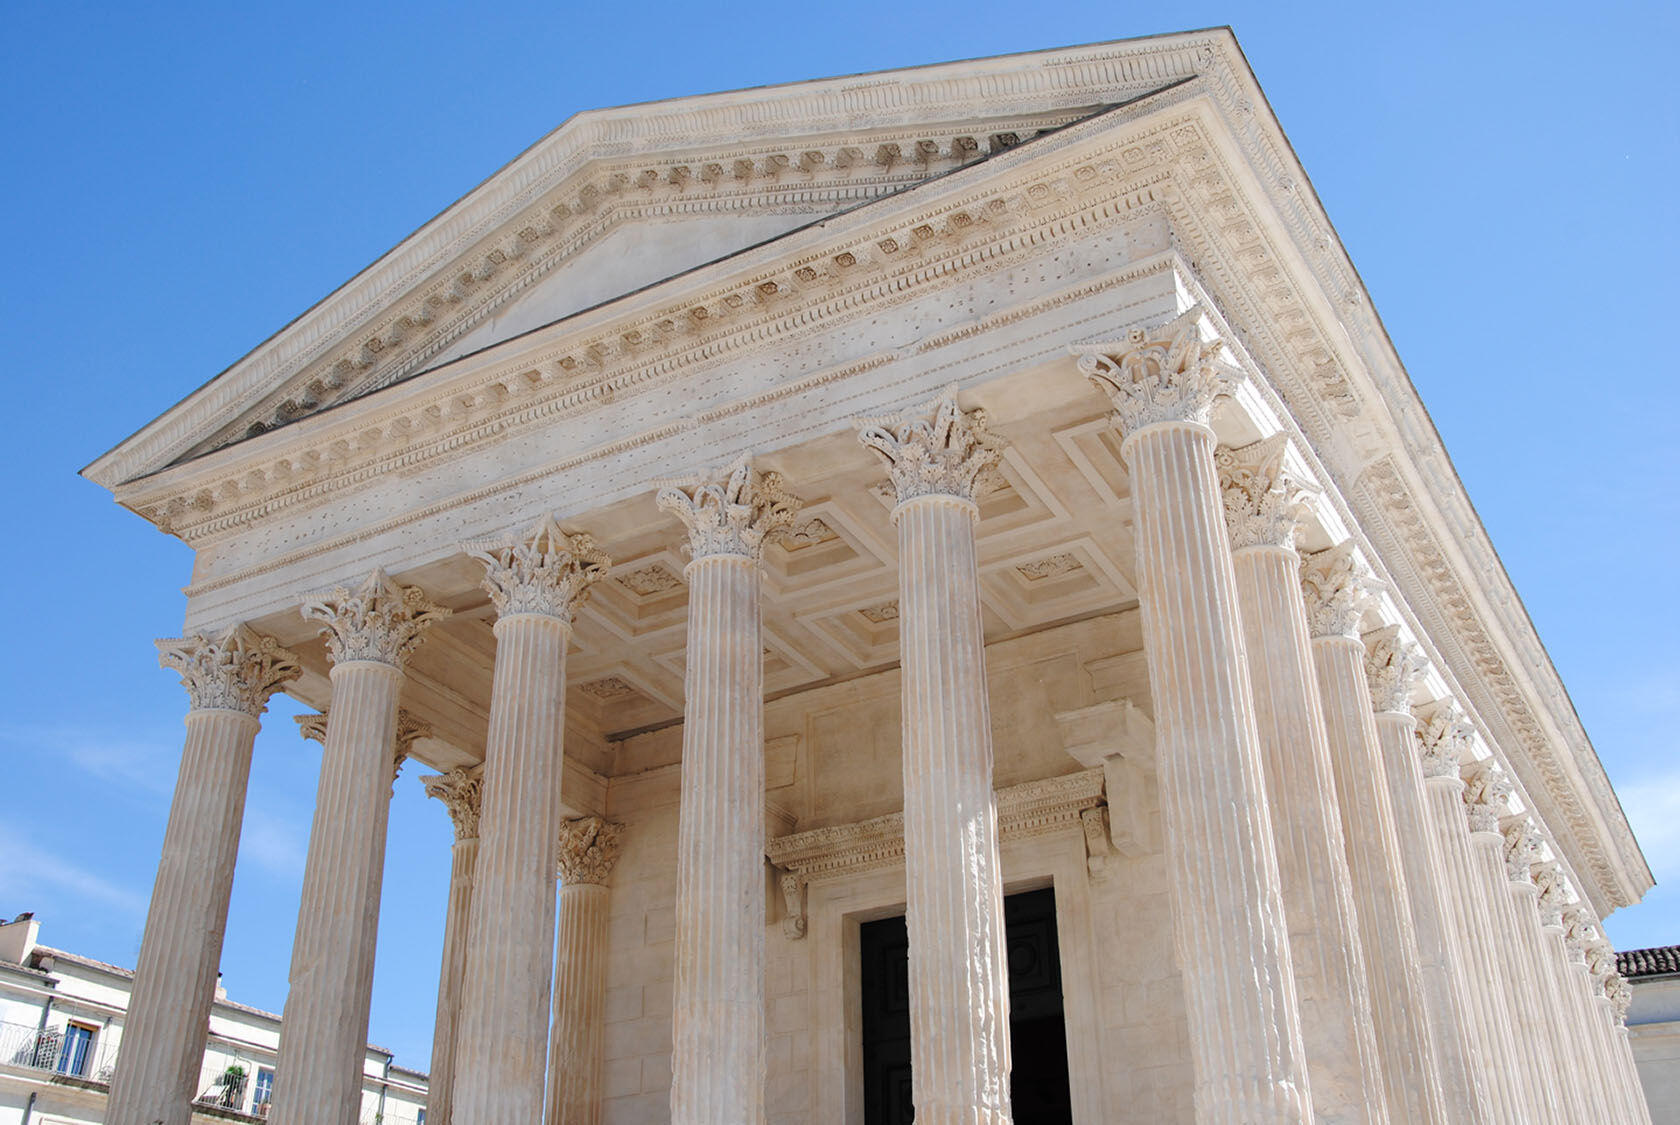 Nîmes Roman History Highlights Maison Carrée